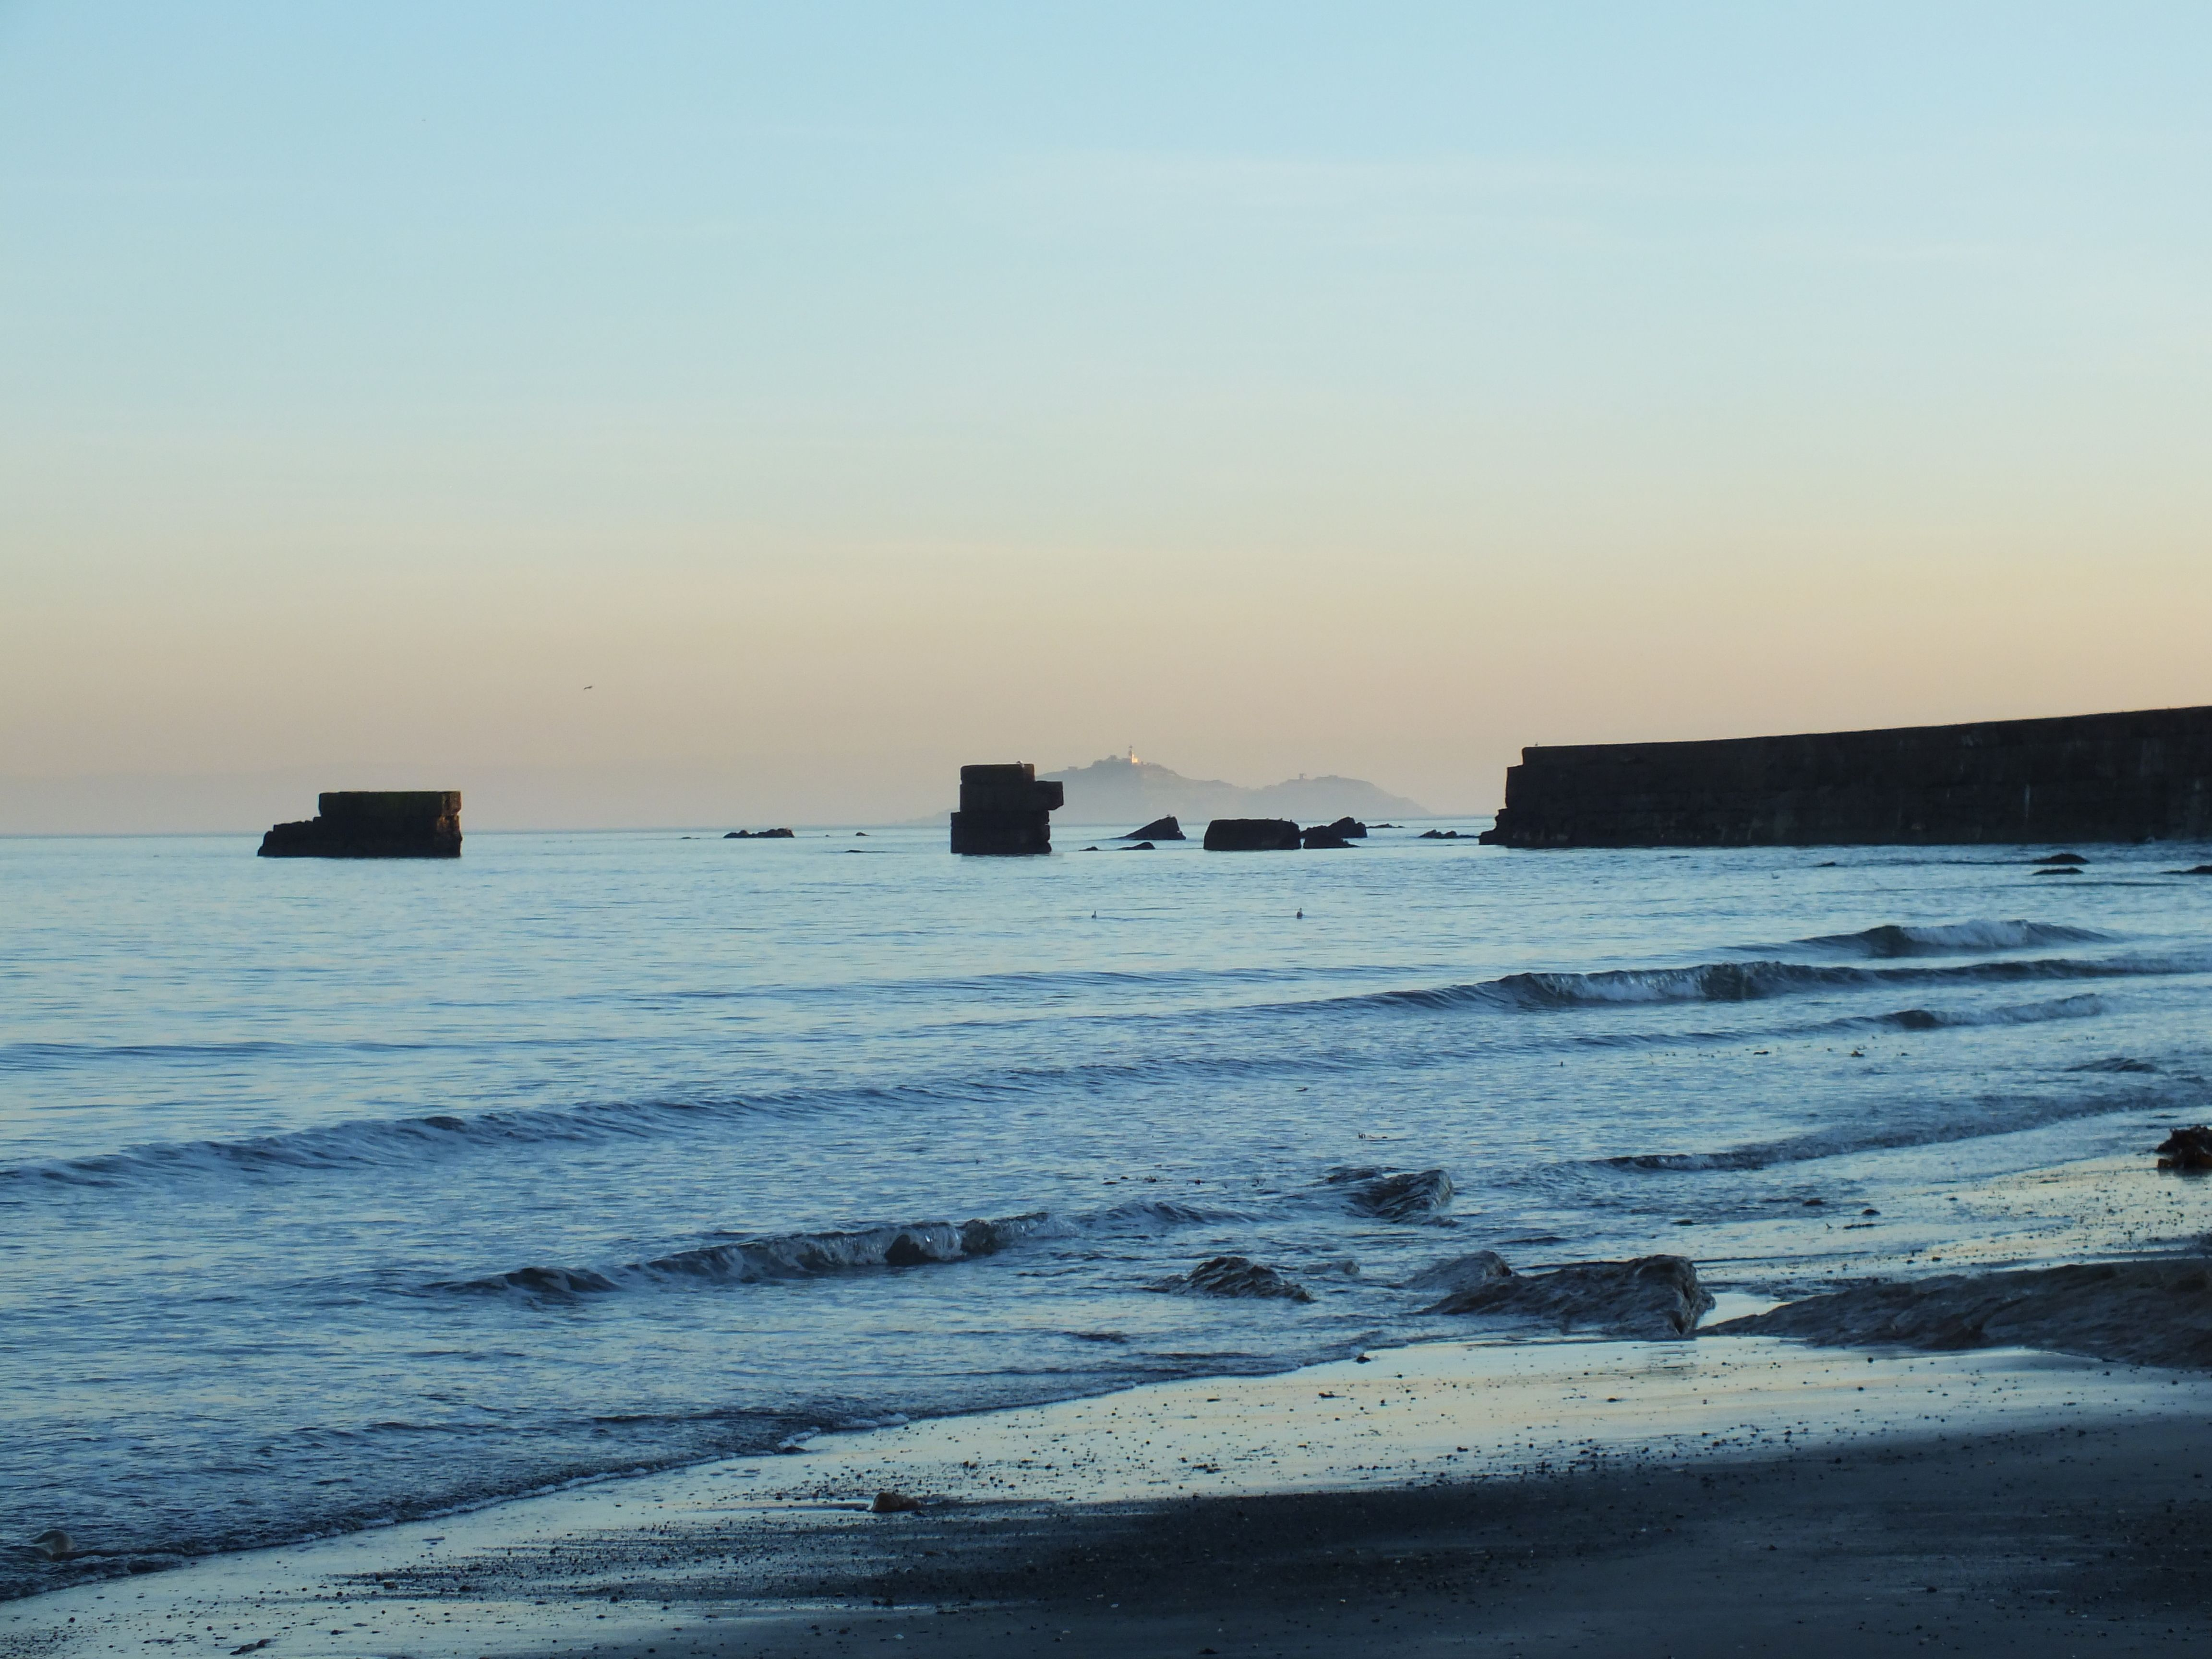 Seafield Beach, Kirkcaldy, Scotland